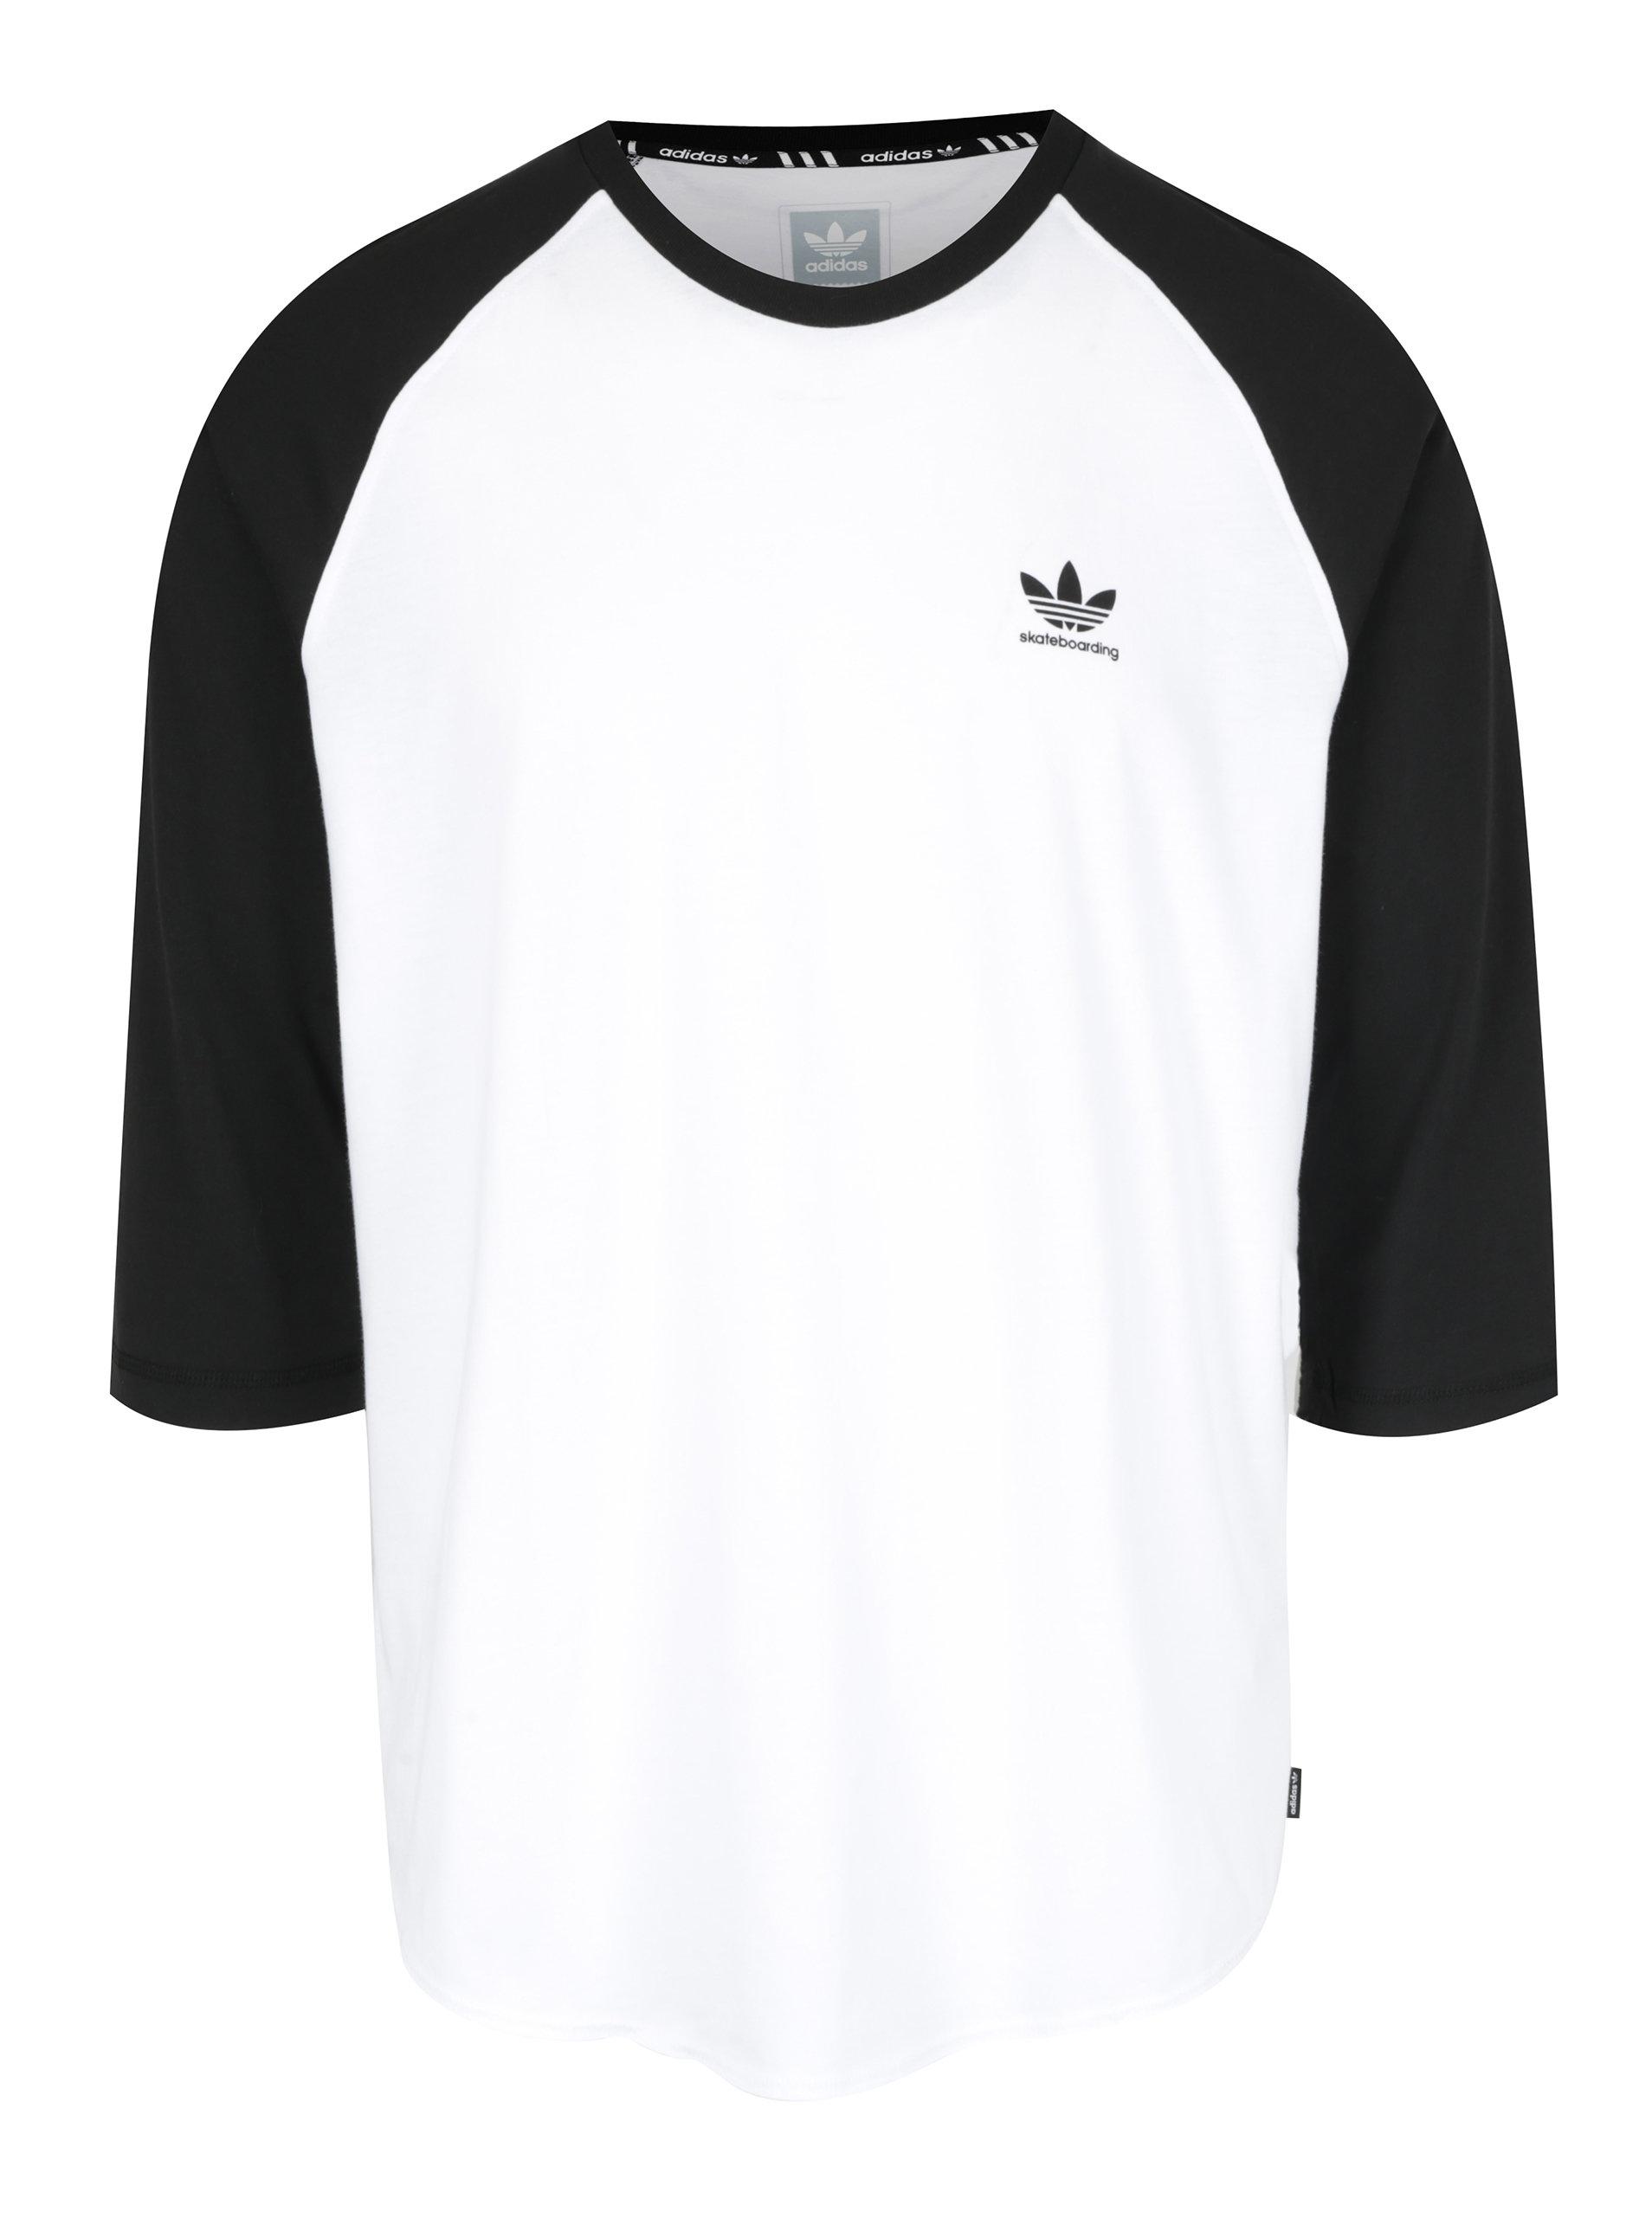 Černo-bílé pánské tričko s 3 4 rukávem adidas Originals ... a5756a50187